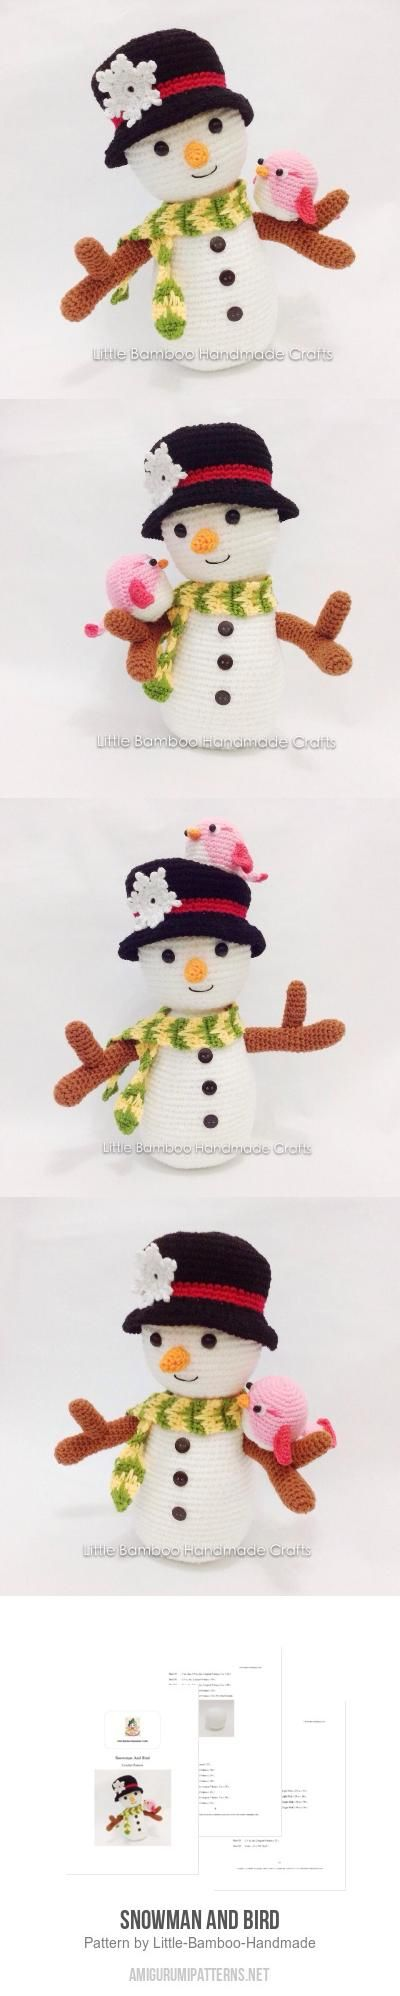 261 best Árboles De Navidad images on Pinterest | Christmas crafts ...